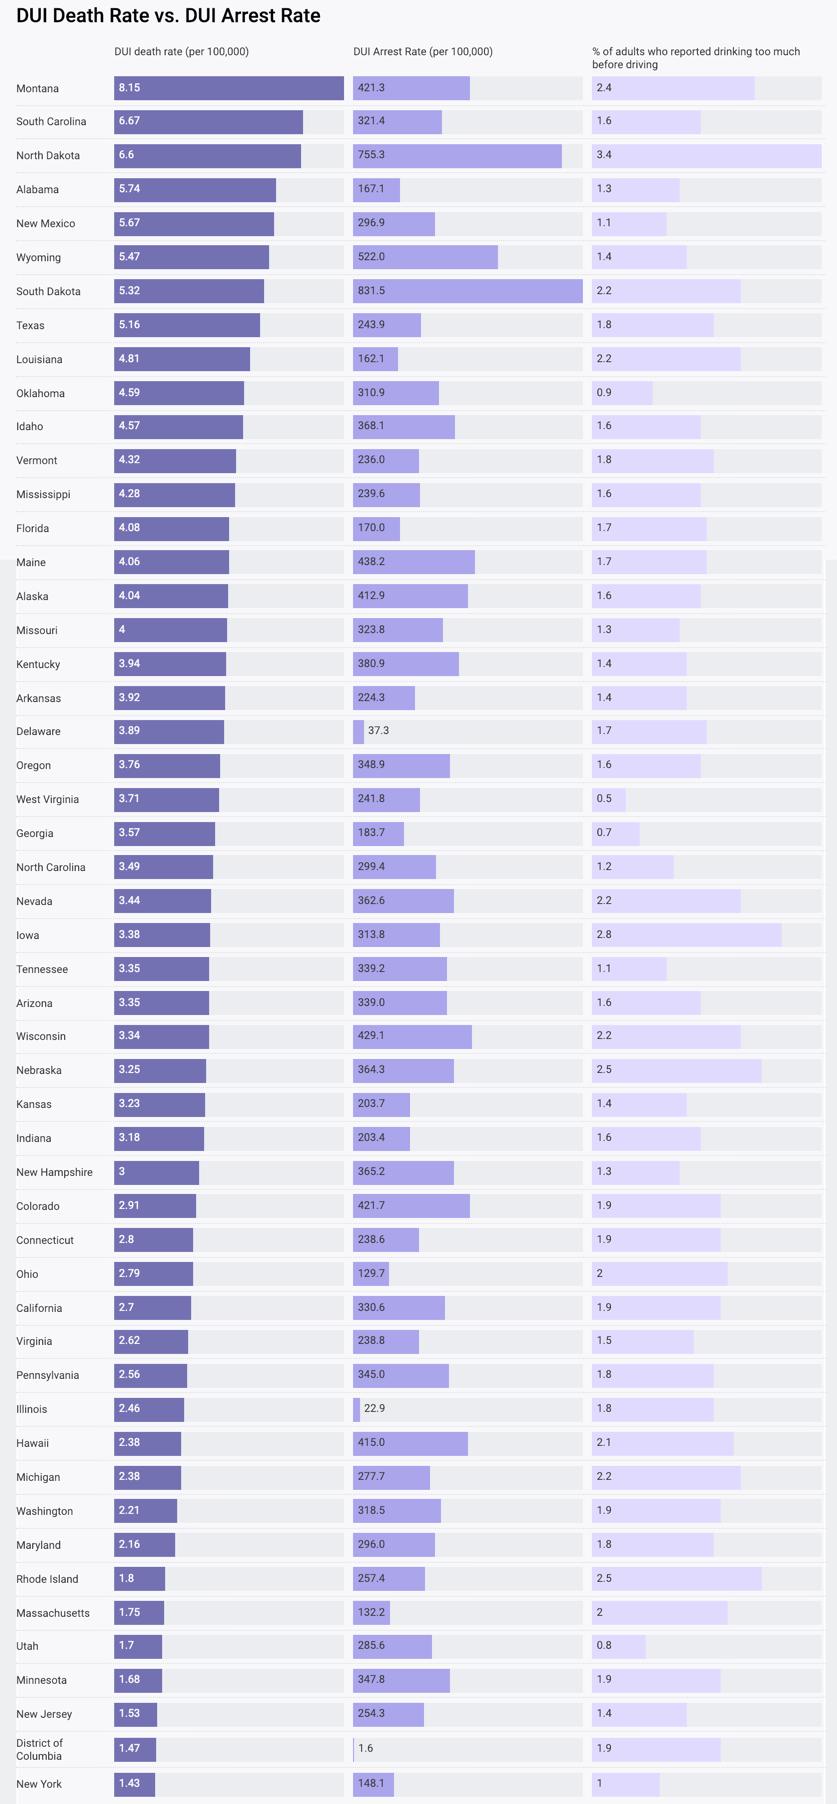 DUI fatality rates vs arrest rate